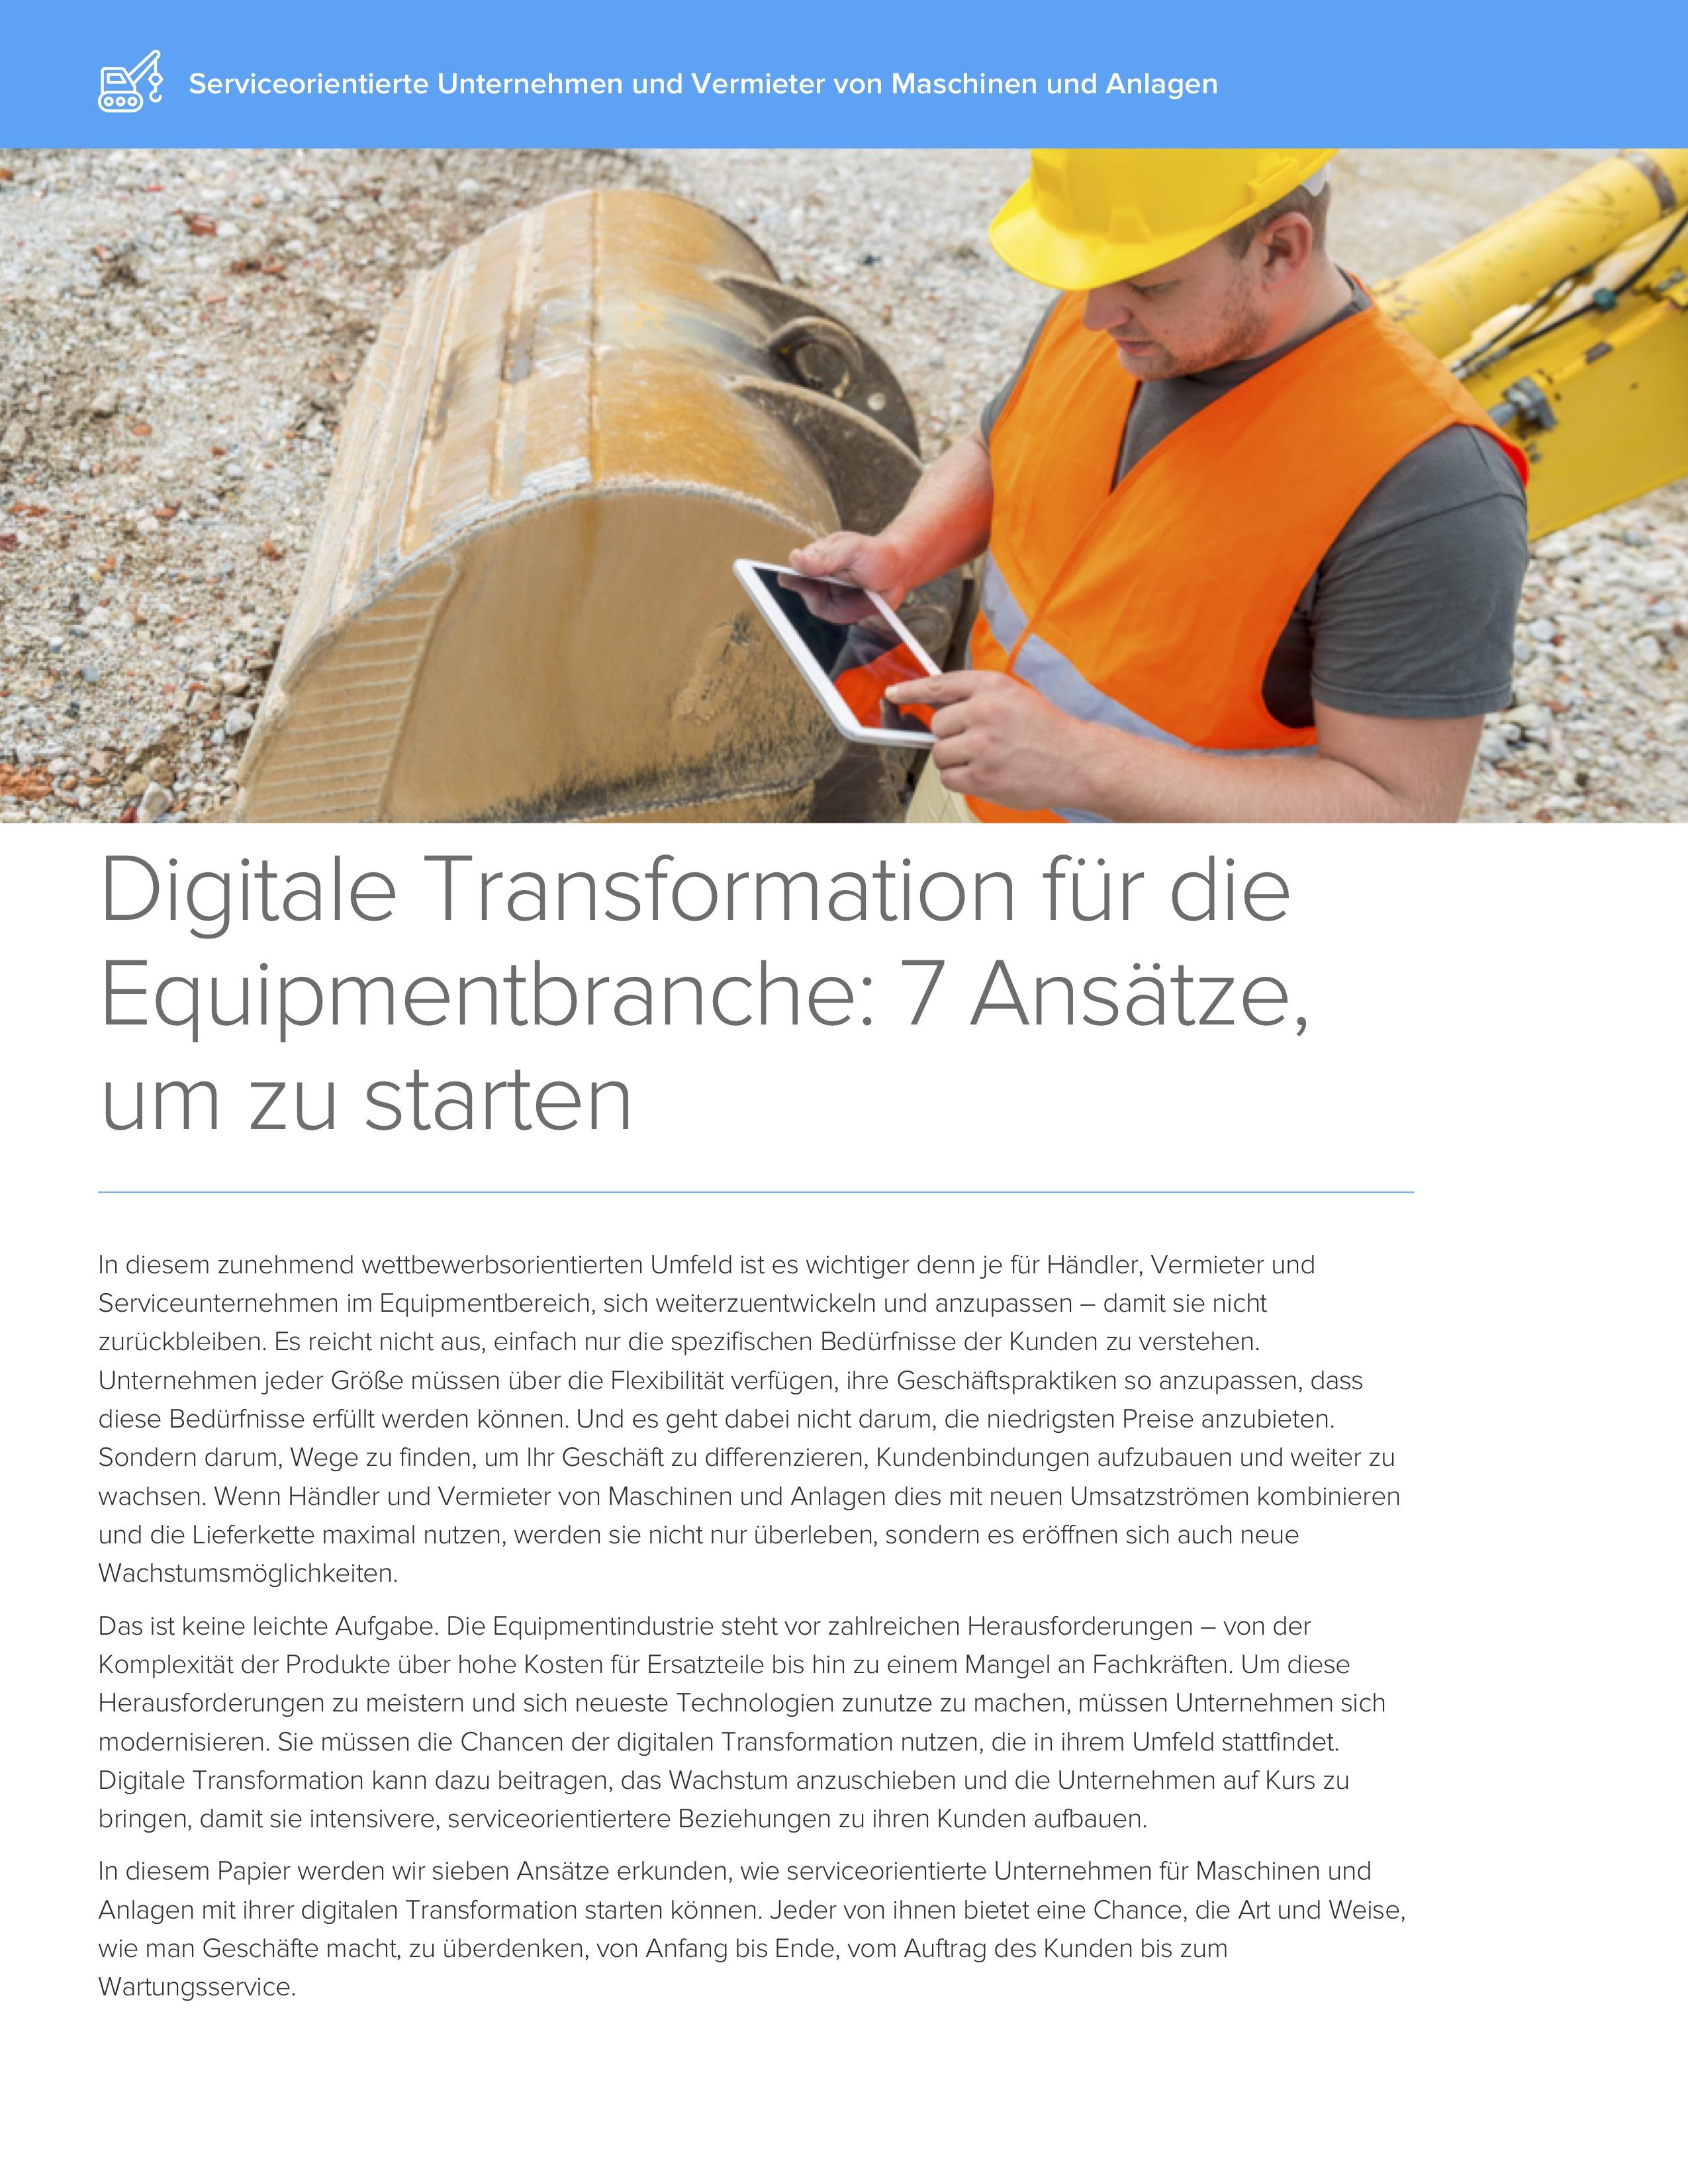 Square cropped digitalisierung fu%cc%88r die equipmentbranchecover dd2dc00985b1d741